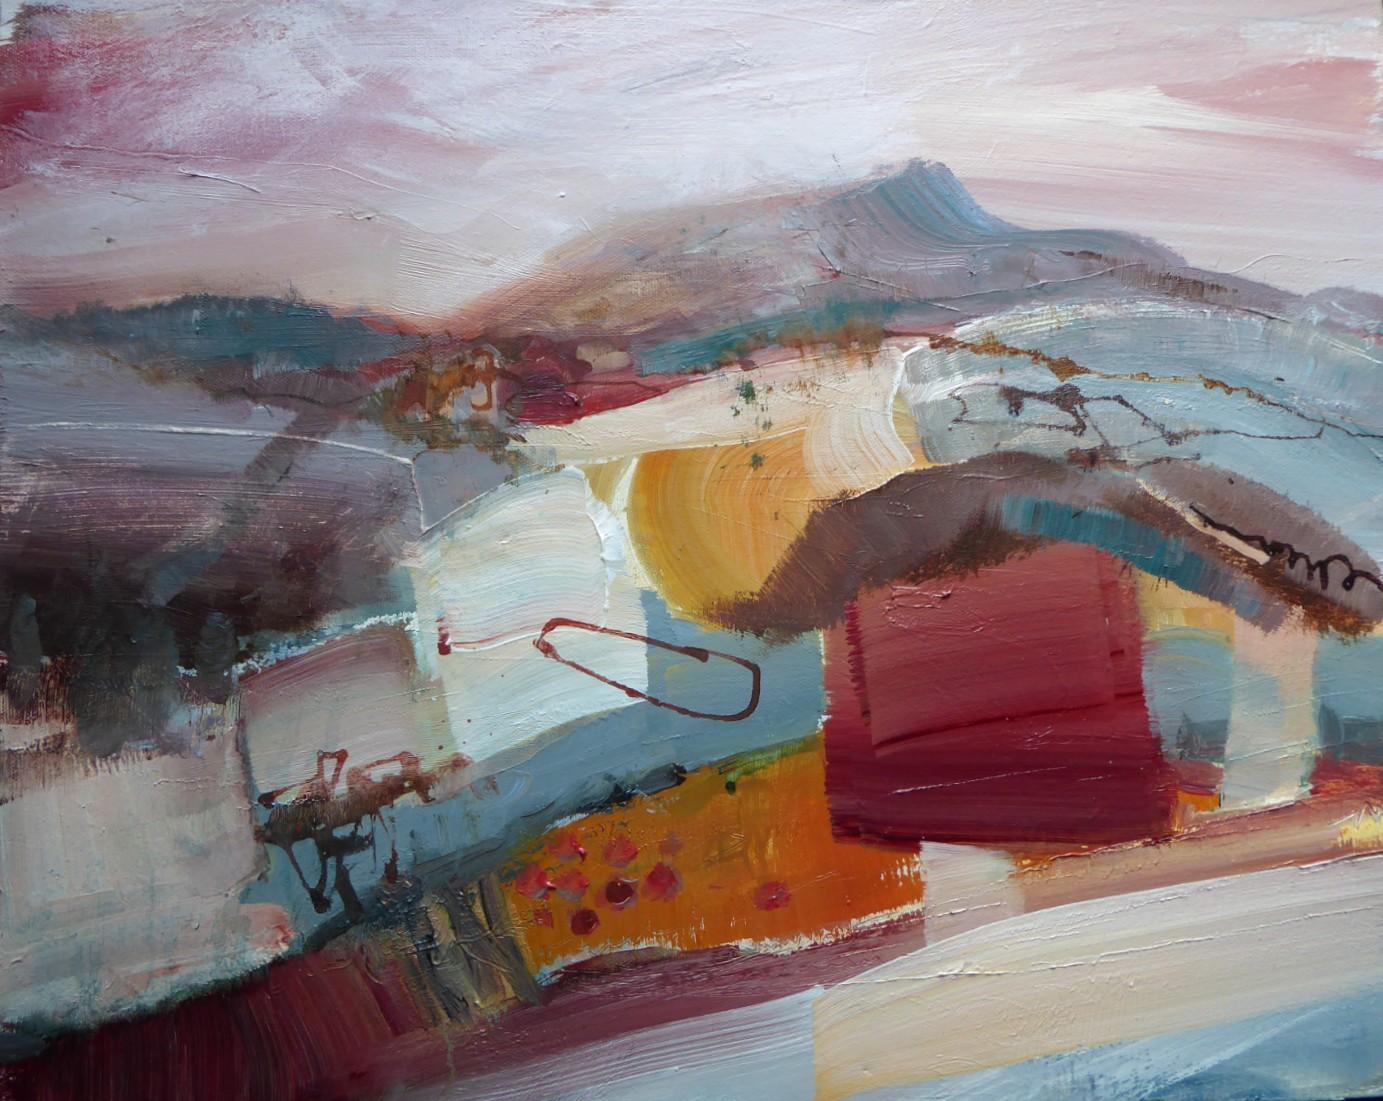 Fields   40 x 50 cm   Acrylic on canvas